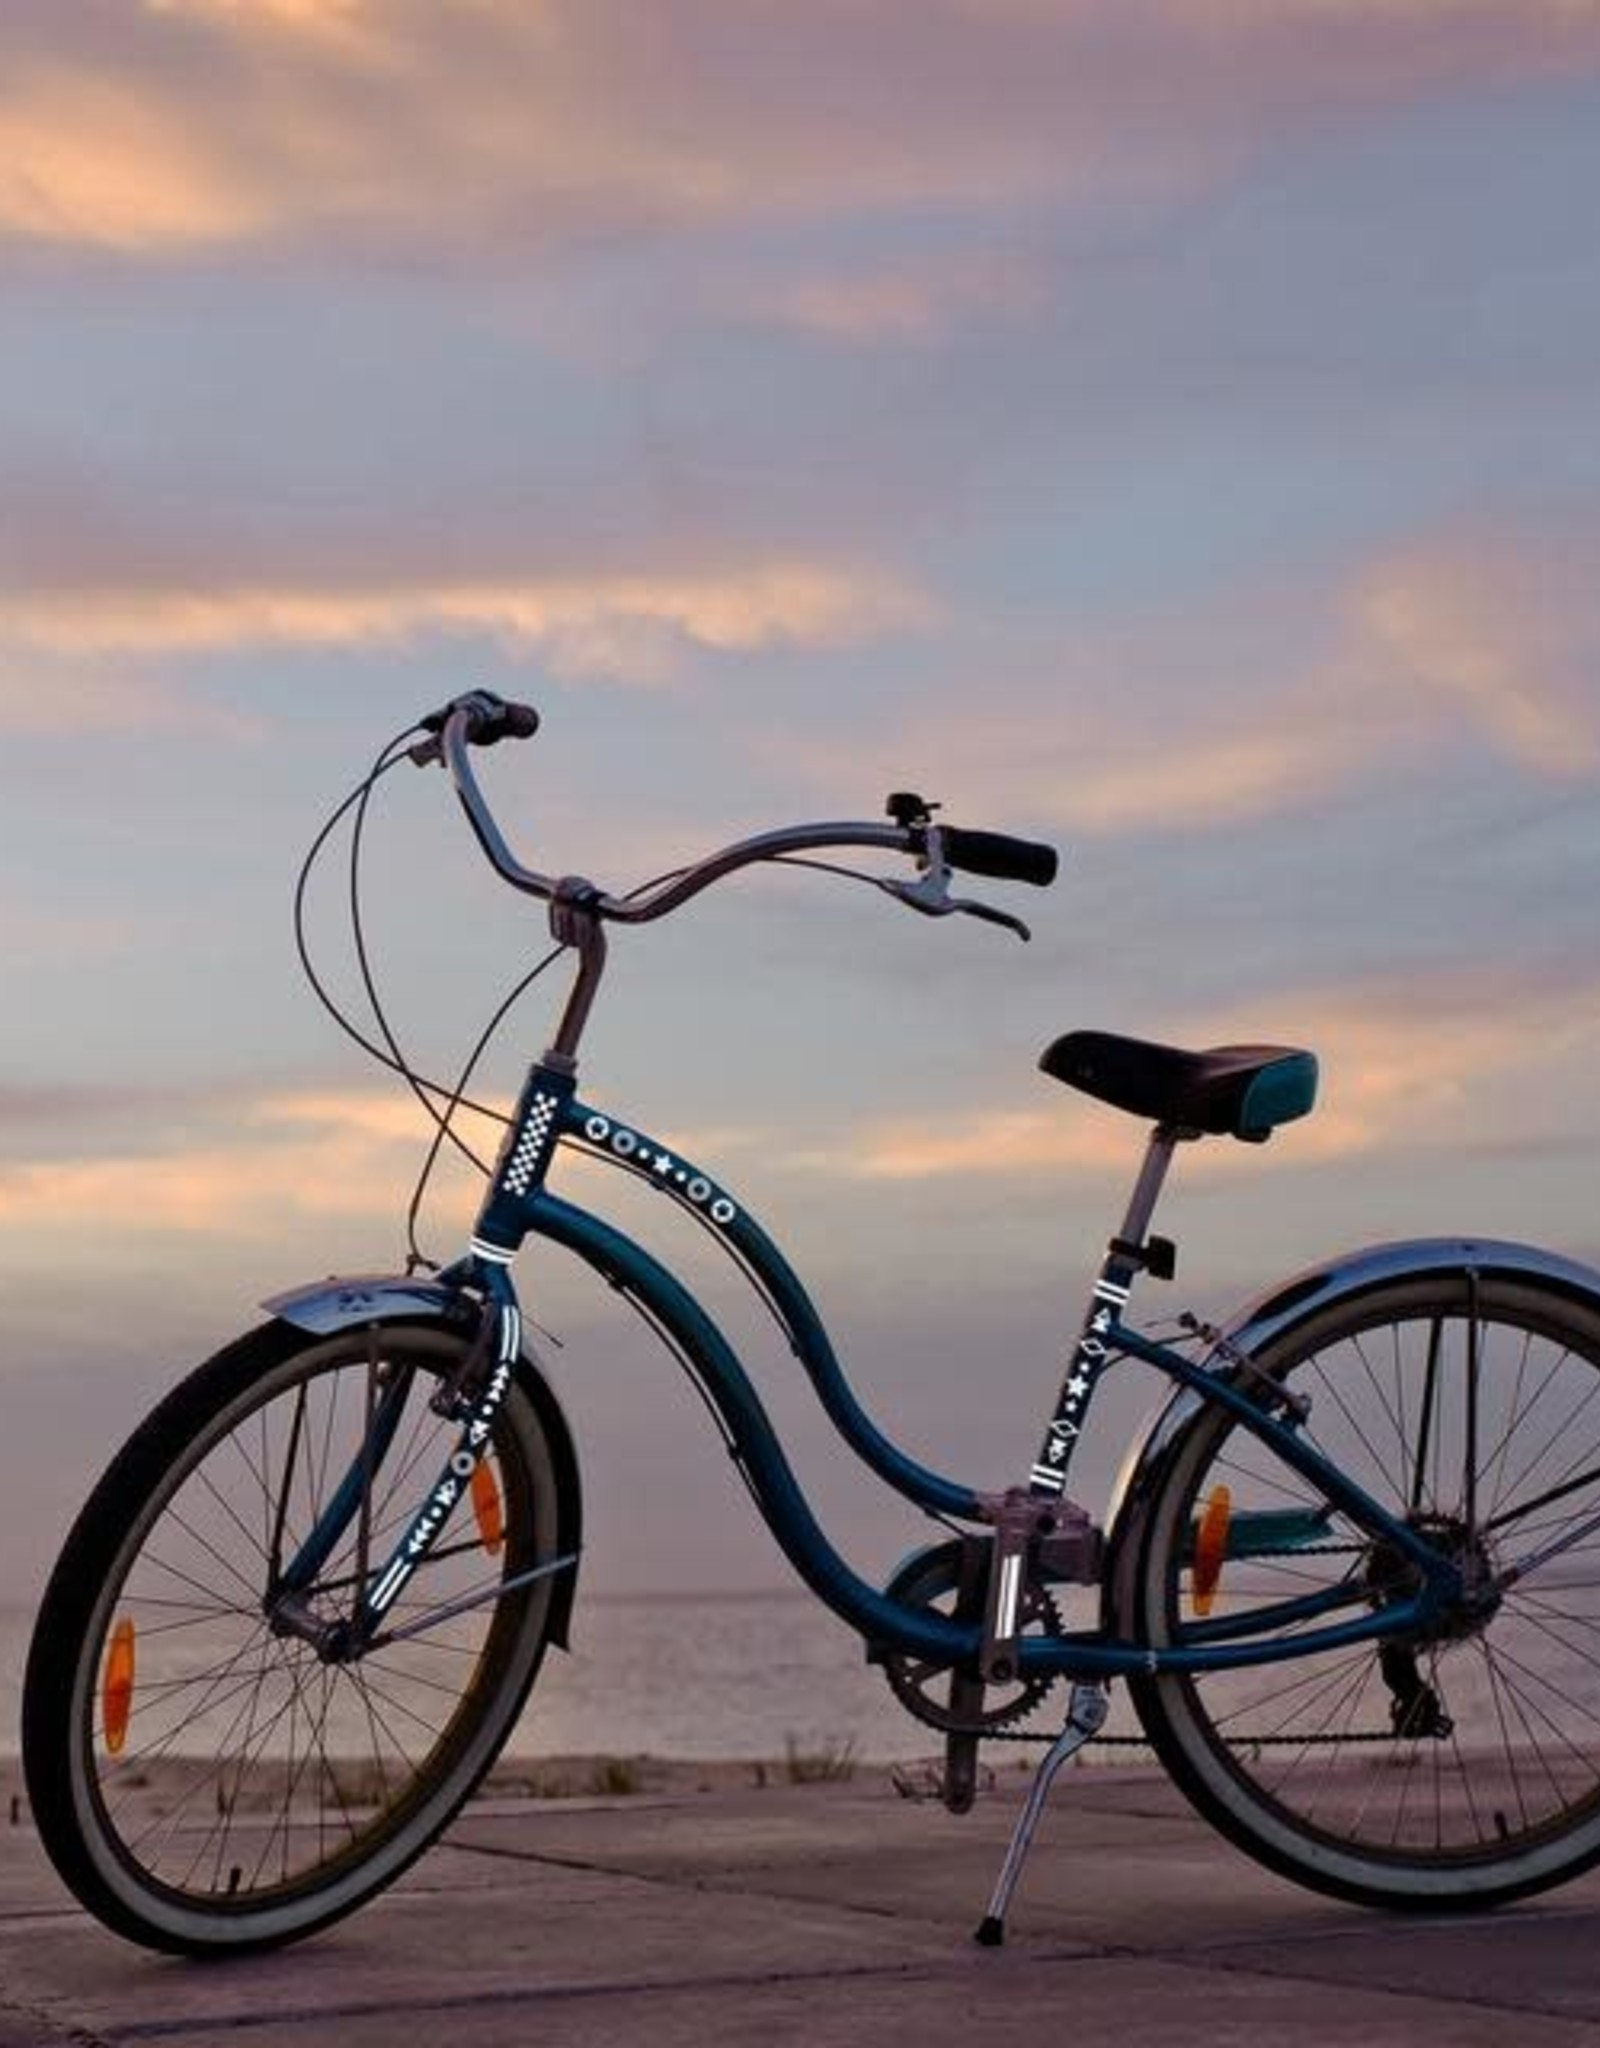 Kikkerland Silver Bicycle Reflector Decals - Kikkerland